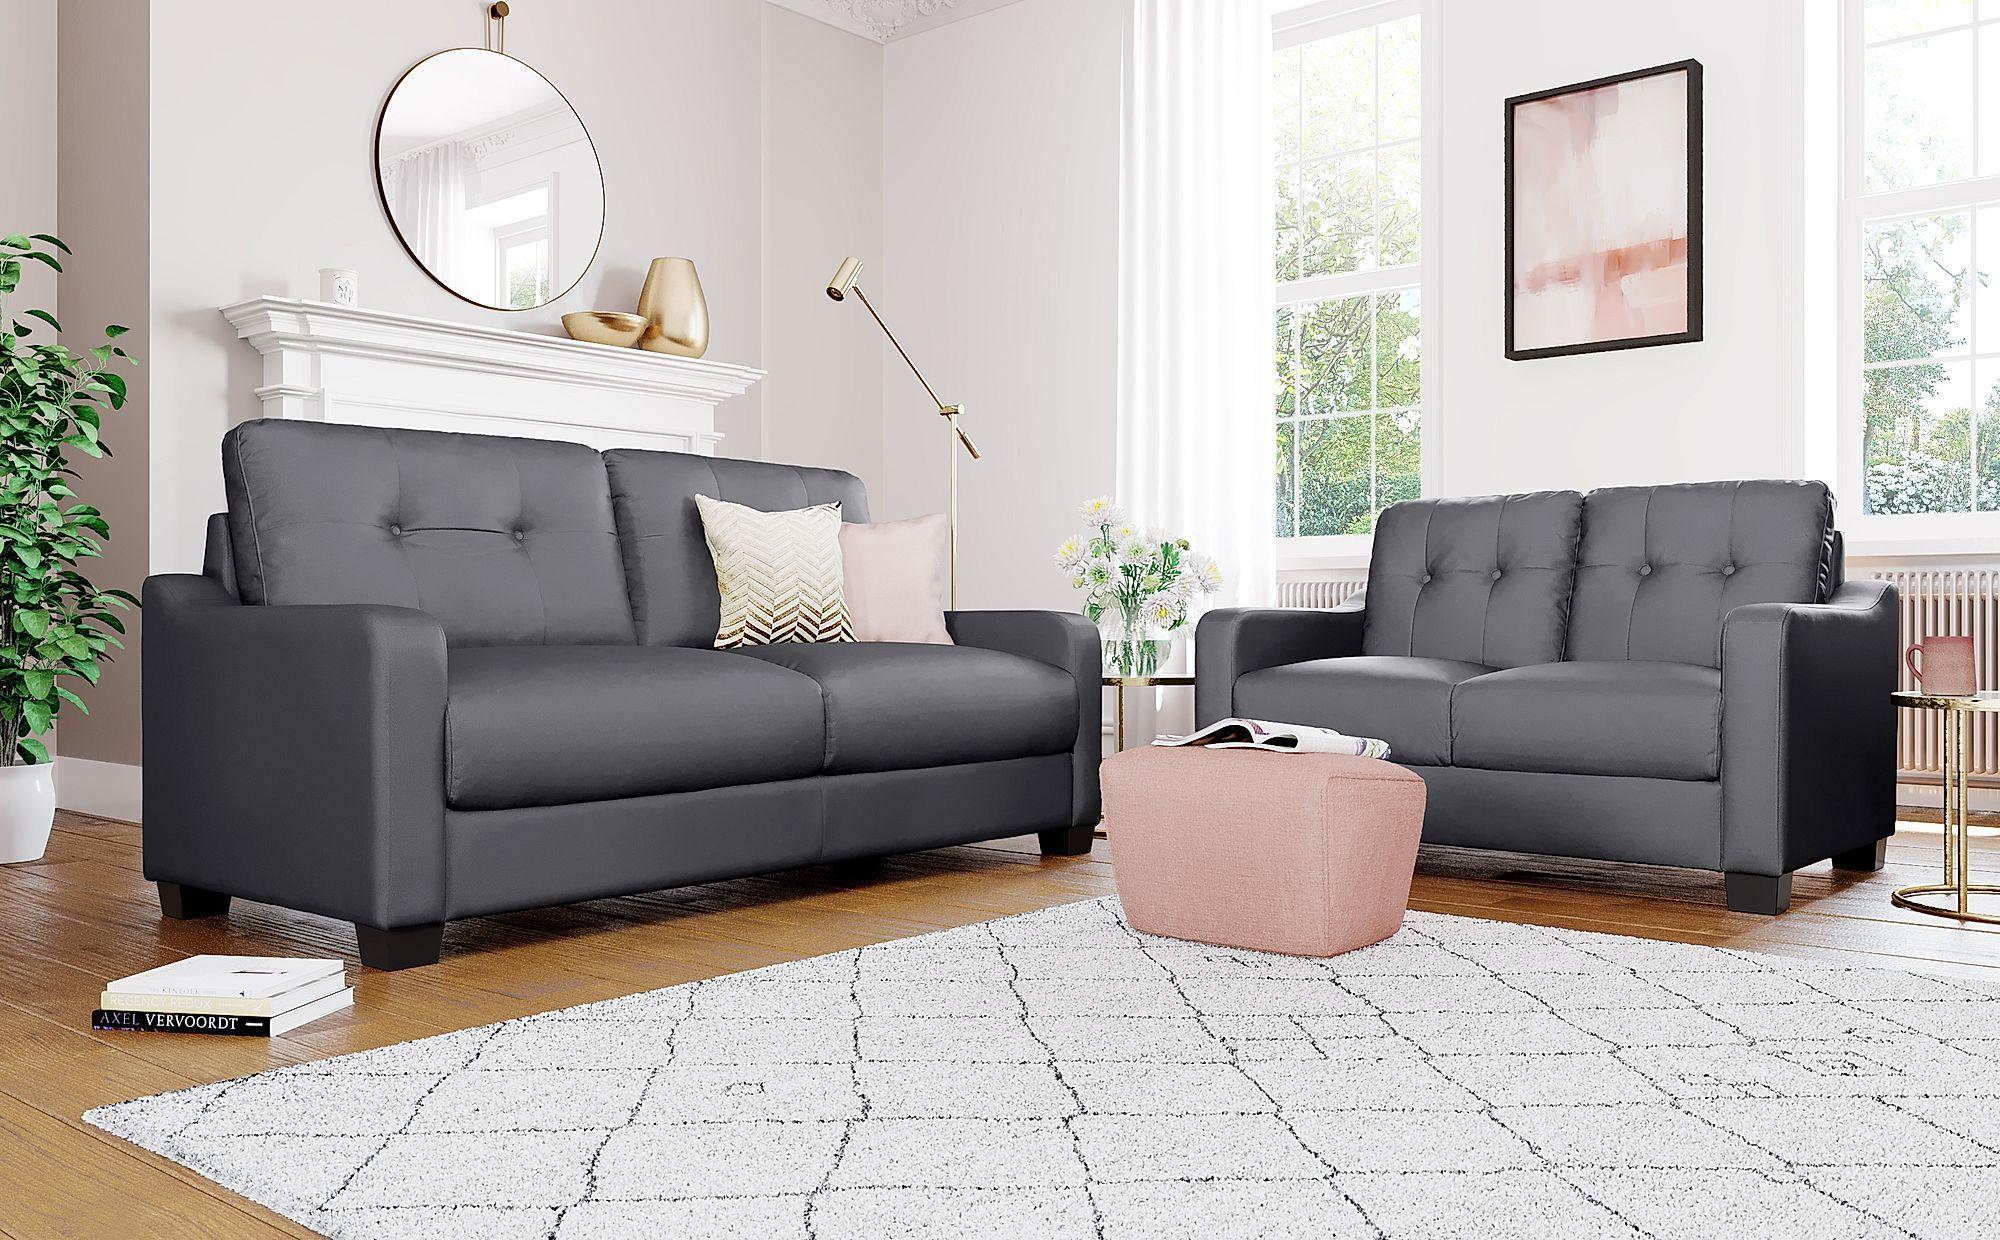 Belmont Grey Leather 3 2 Seater Sofa Set Grey Leather Sofa